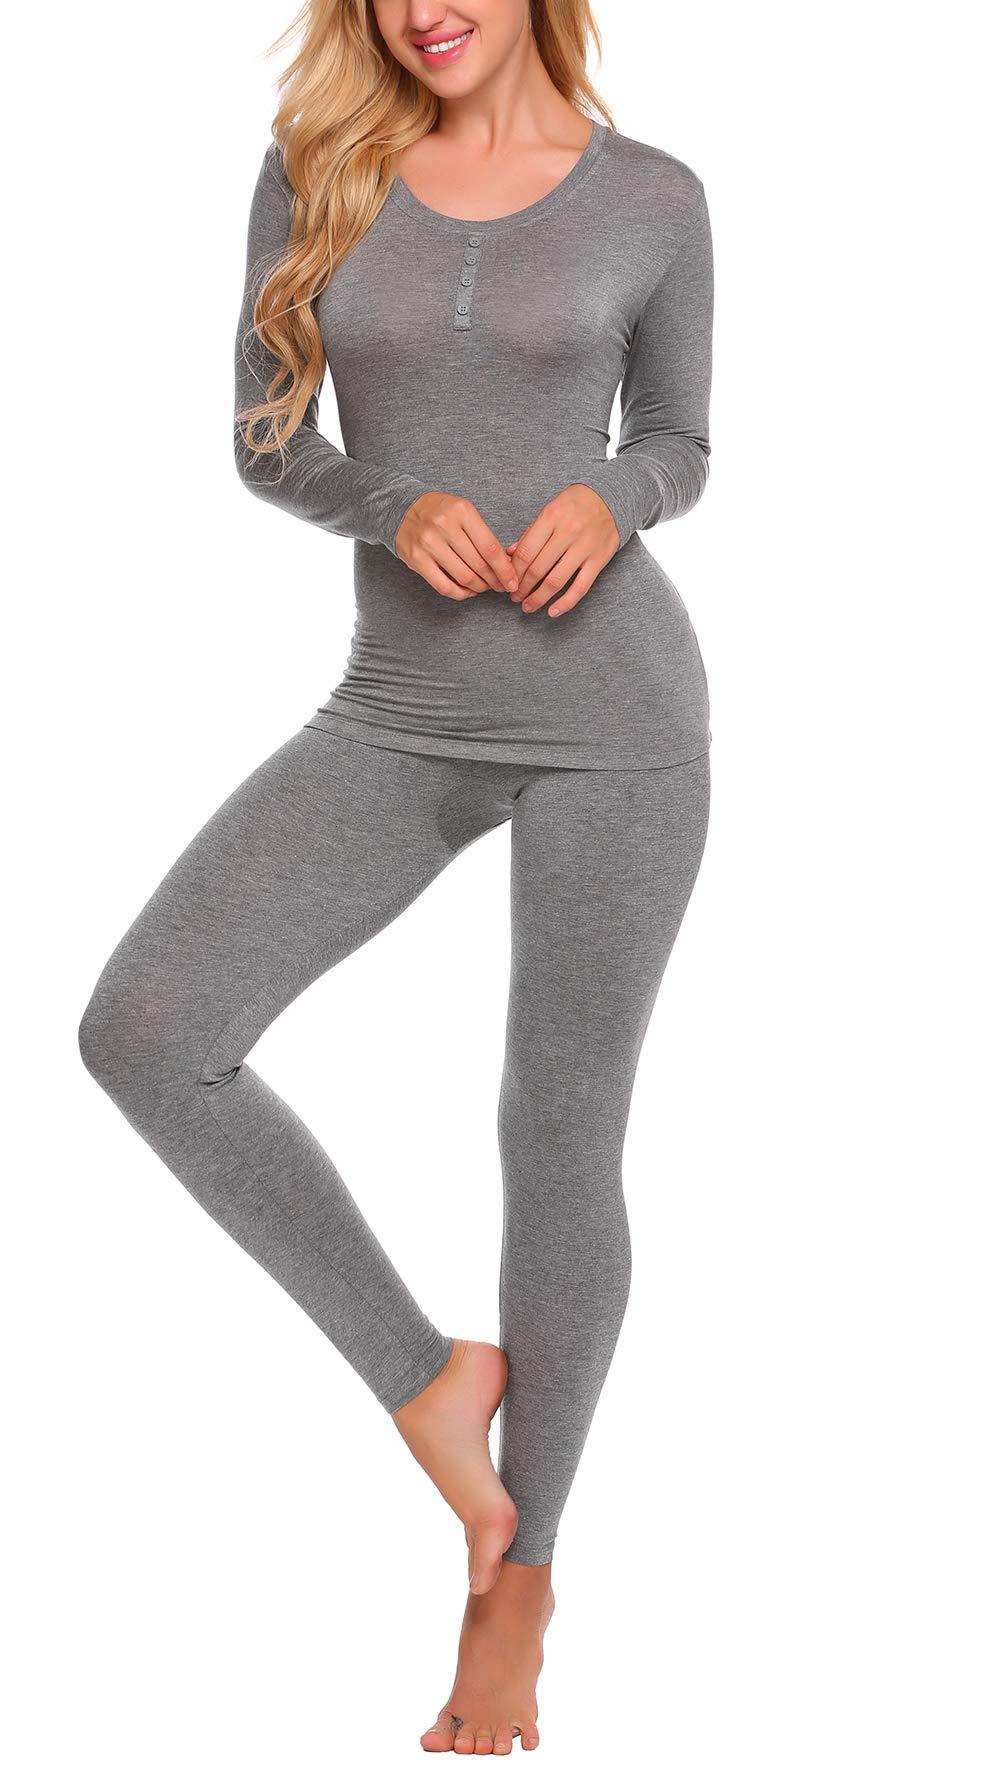 Yozly Thermal Underwear Womens Henley Long Johns Sets Base Layer Top & Bottom S-XXL (Grey,M)